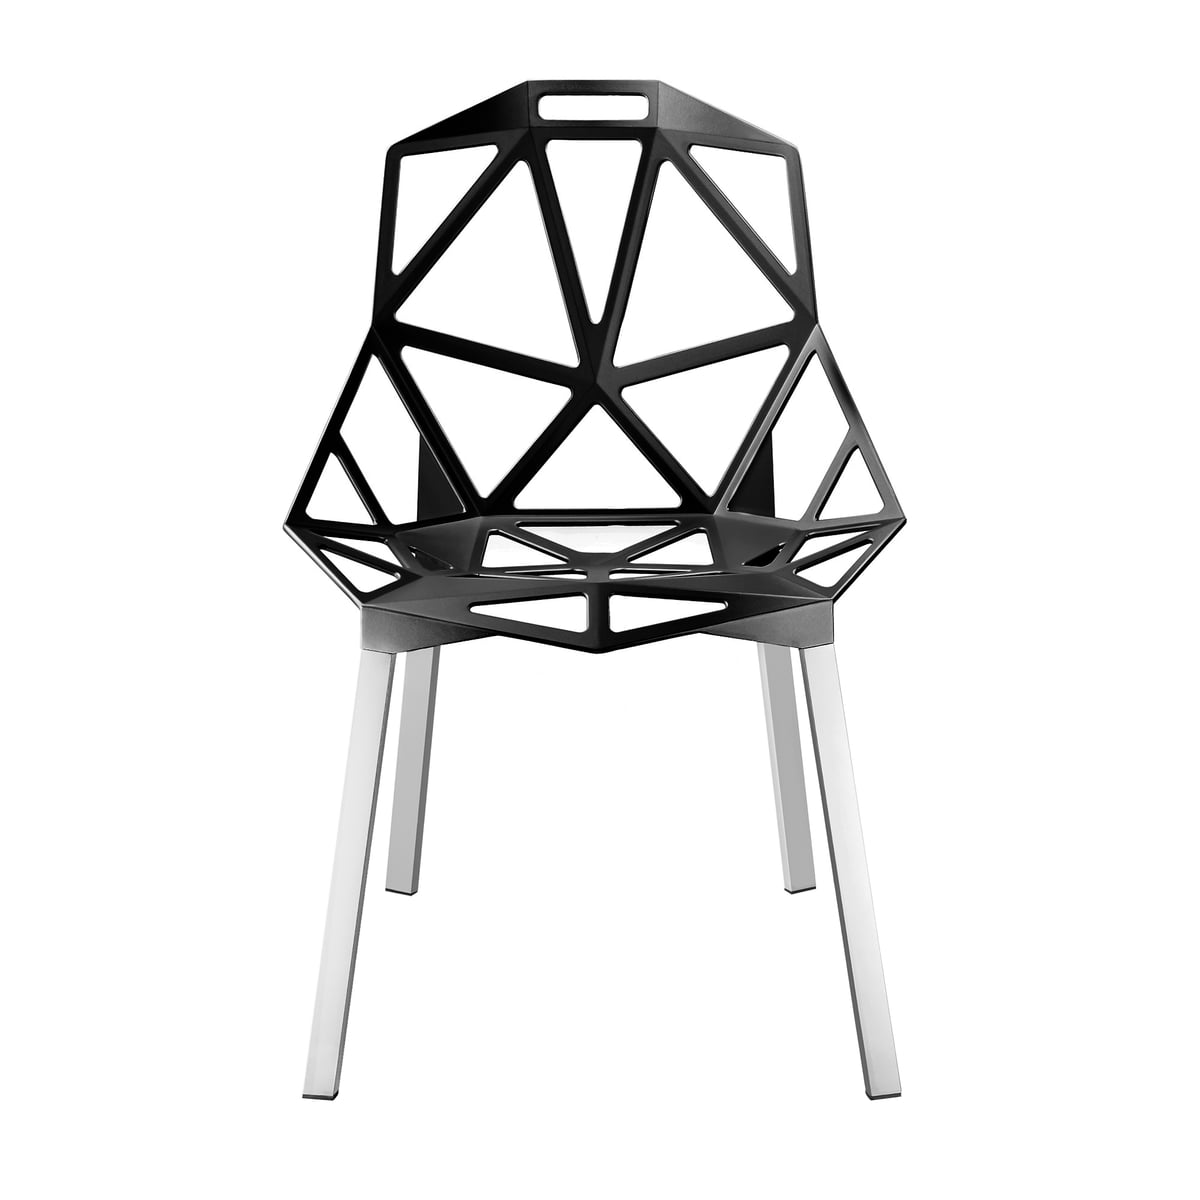 chair one stapelstuhl von magis connox shop. Black Bedroom Furniture Sets. Home Design Ideas